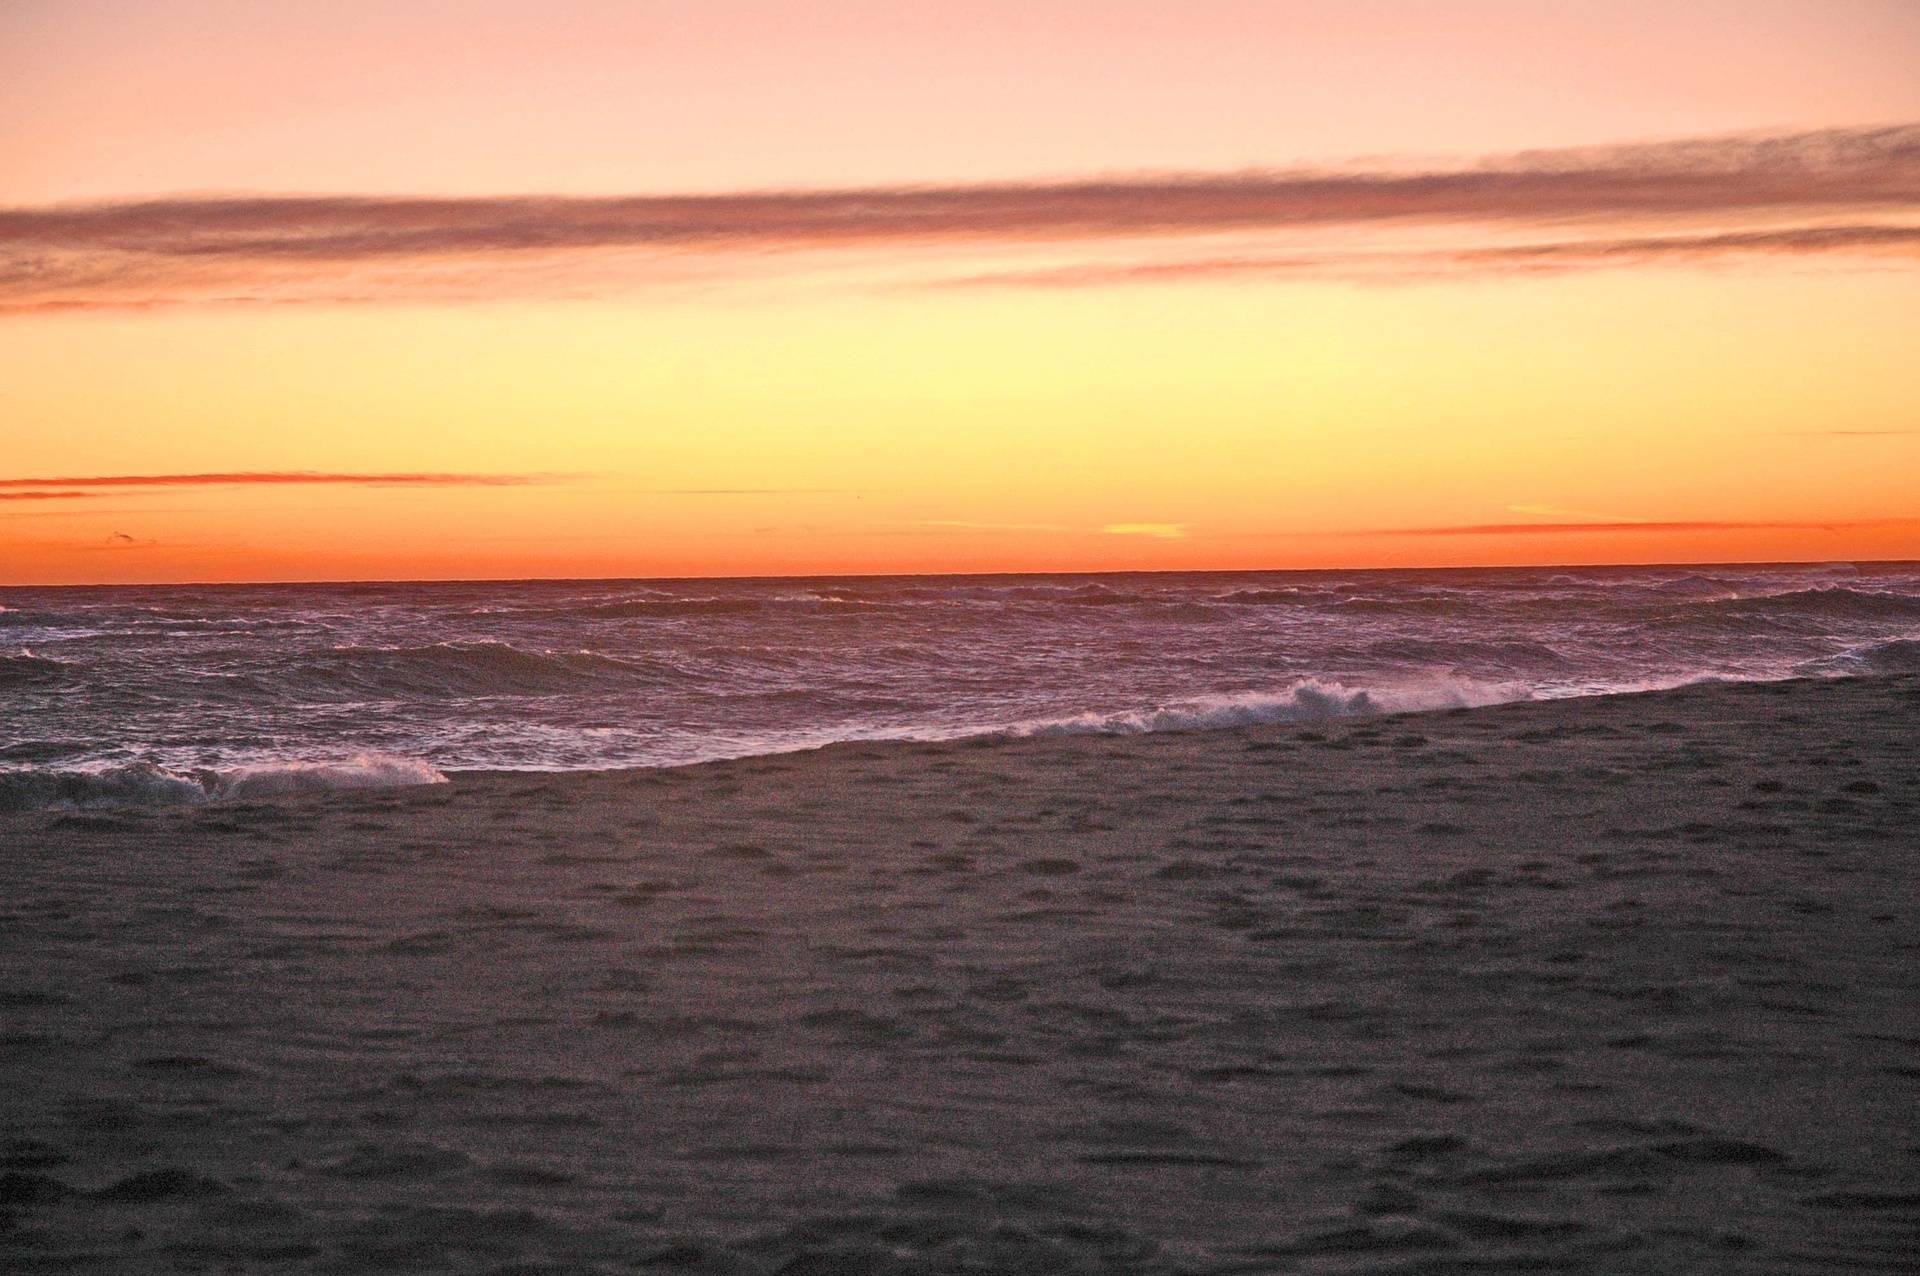 Orange and purple sunset at South Beach